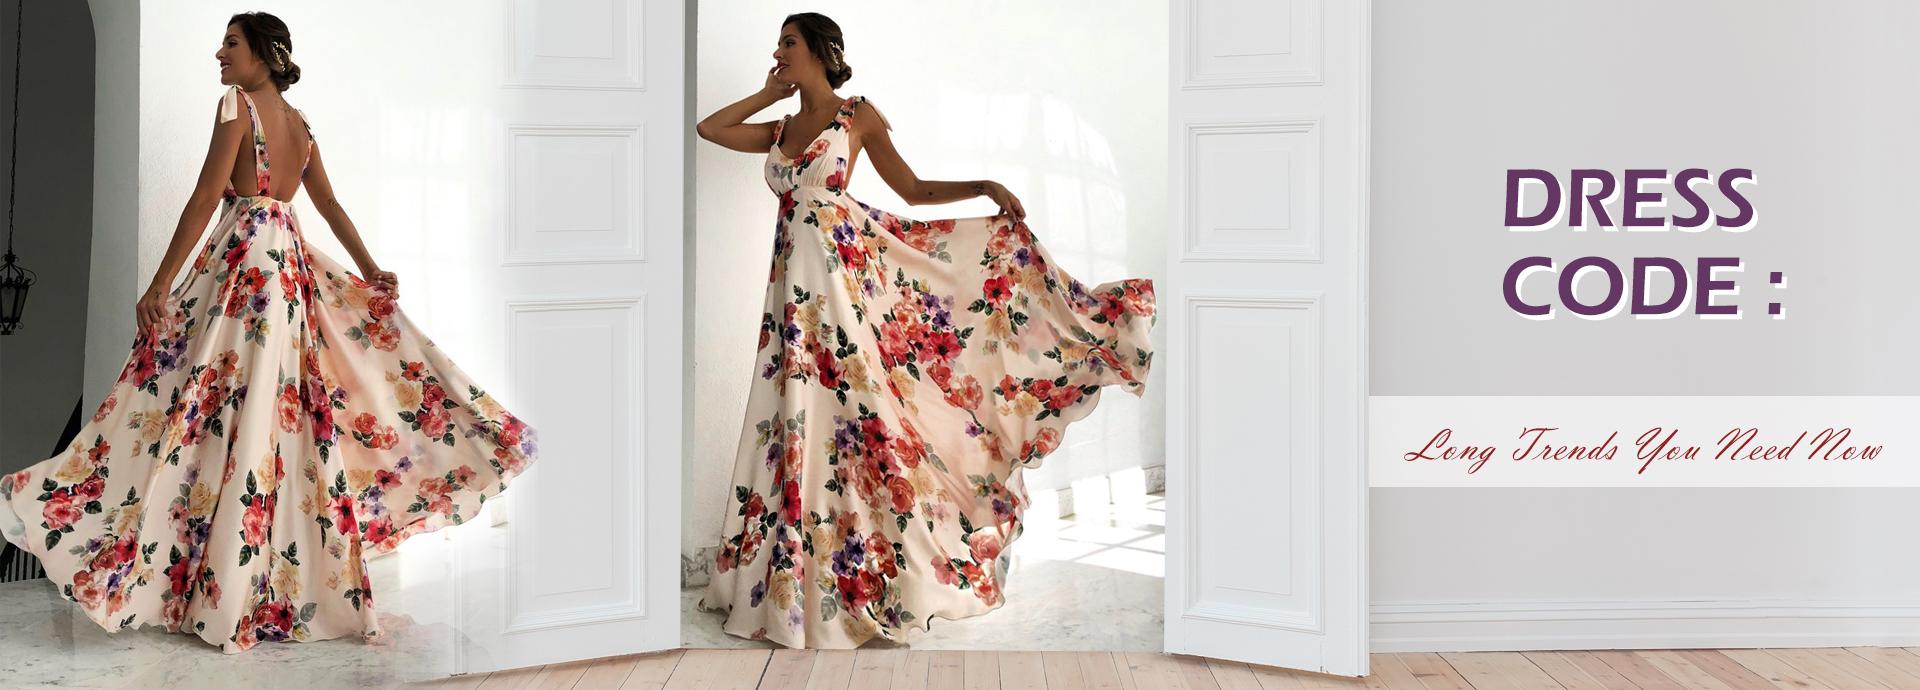 Dress Code Long